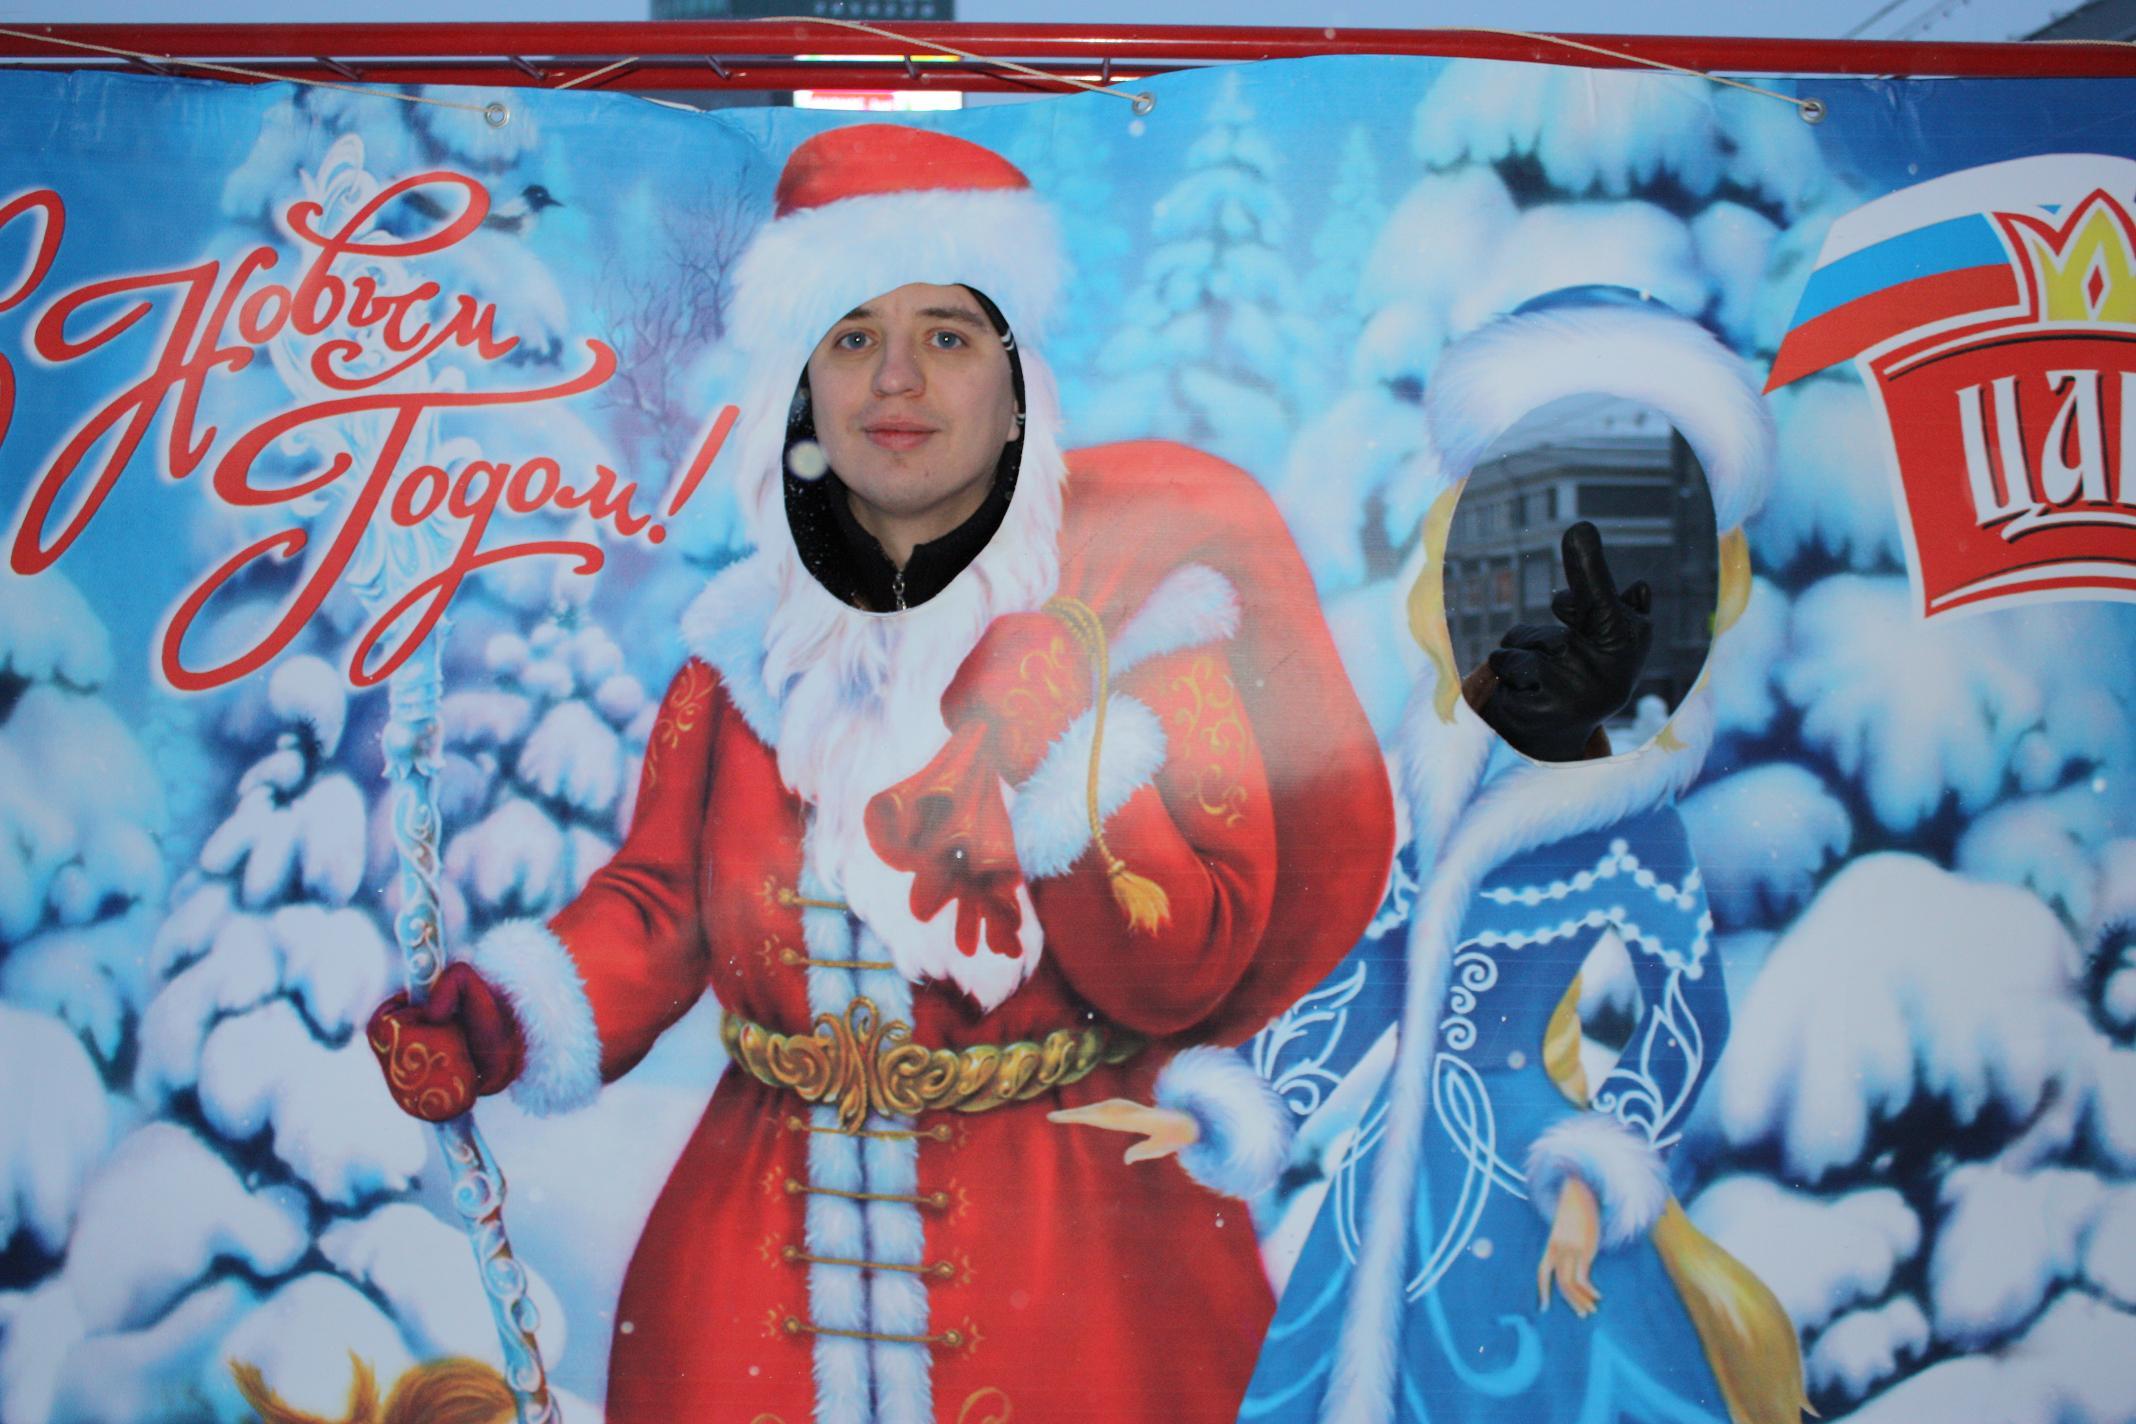 челябинский Дед Мороз